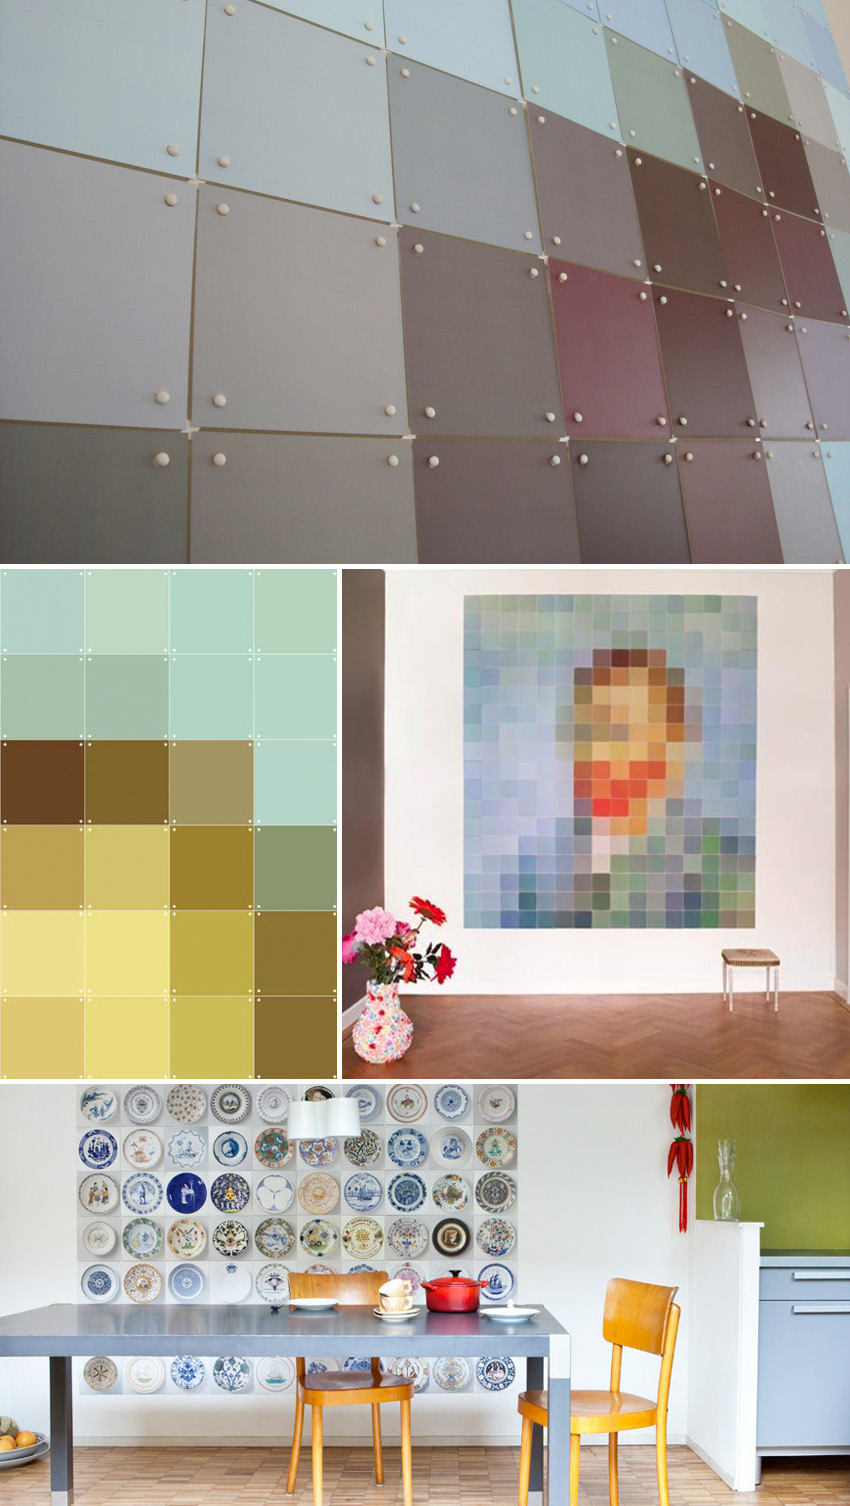 ixxi pixelated wall images photo wall modular photo system ixxi - Pixelated Interior Design